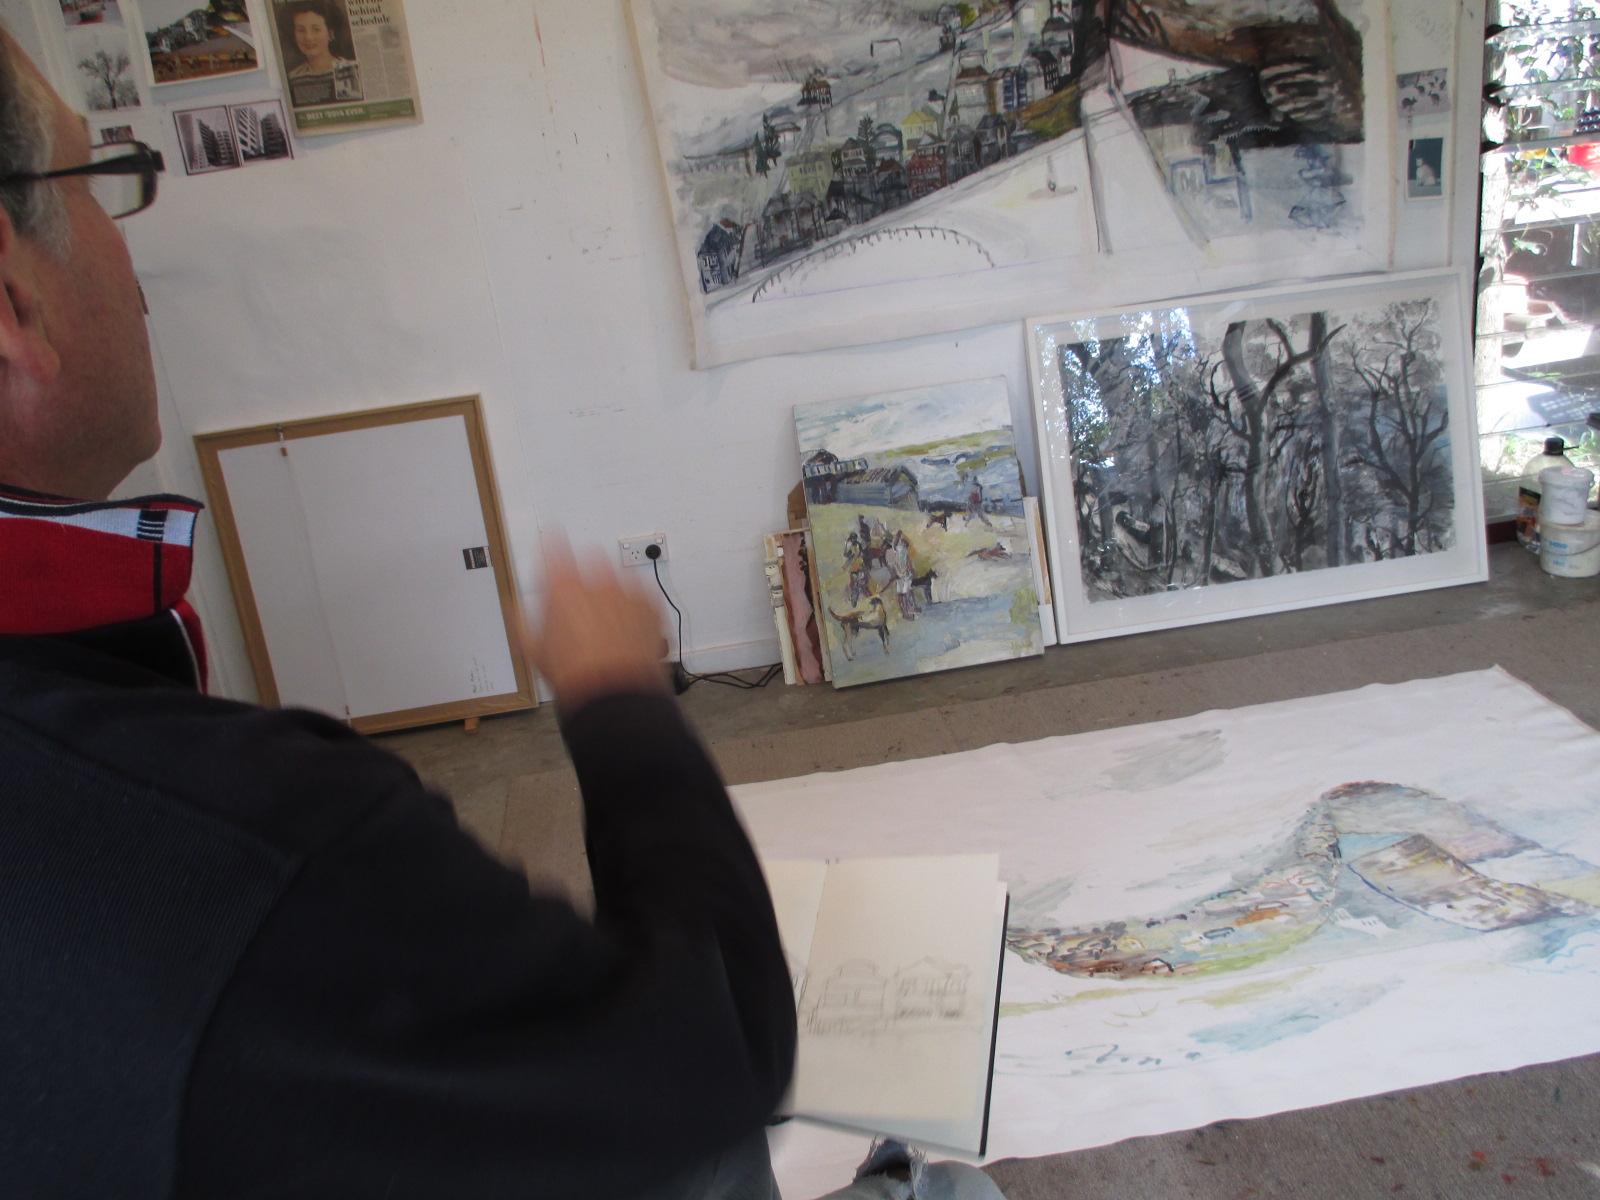 Paul in his home studio earlier in 2015